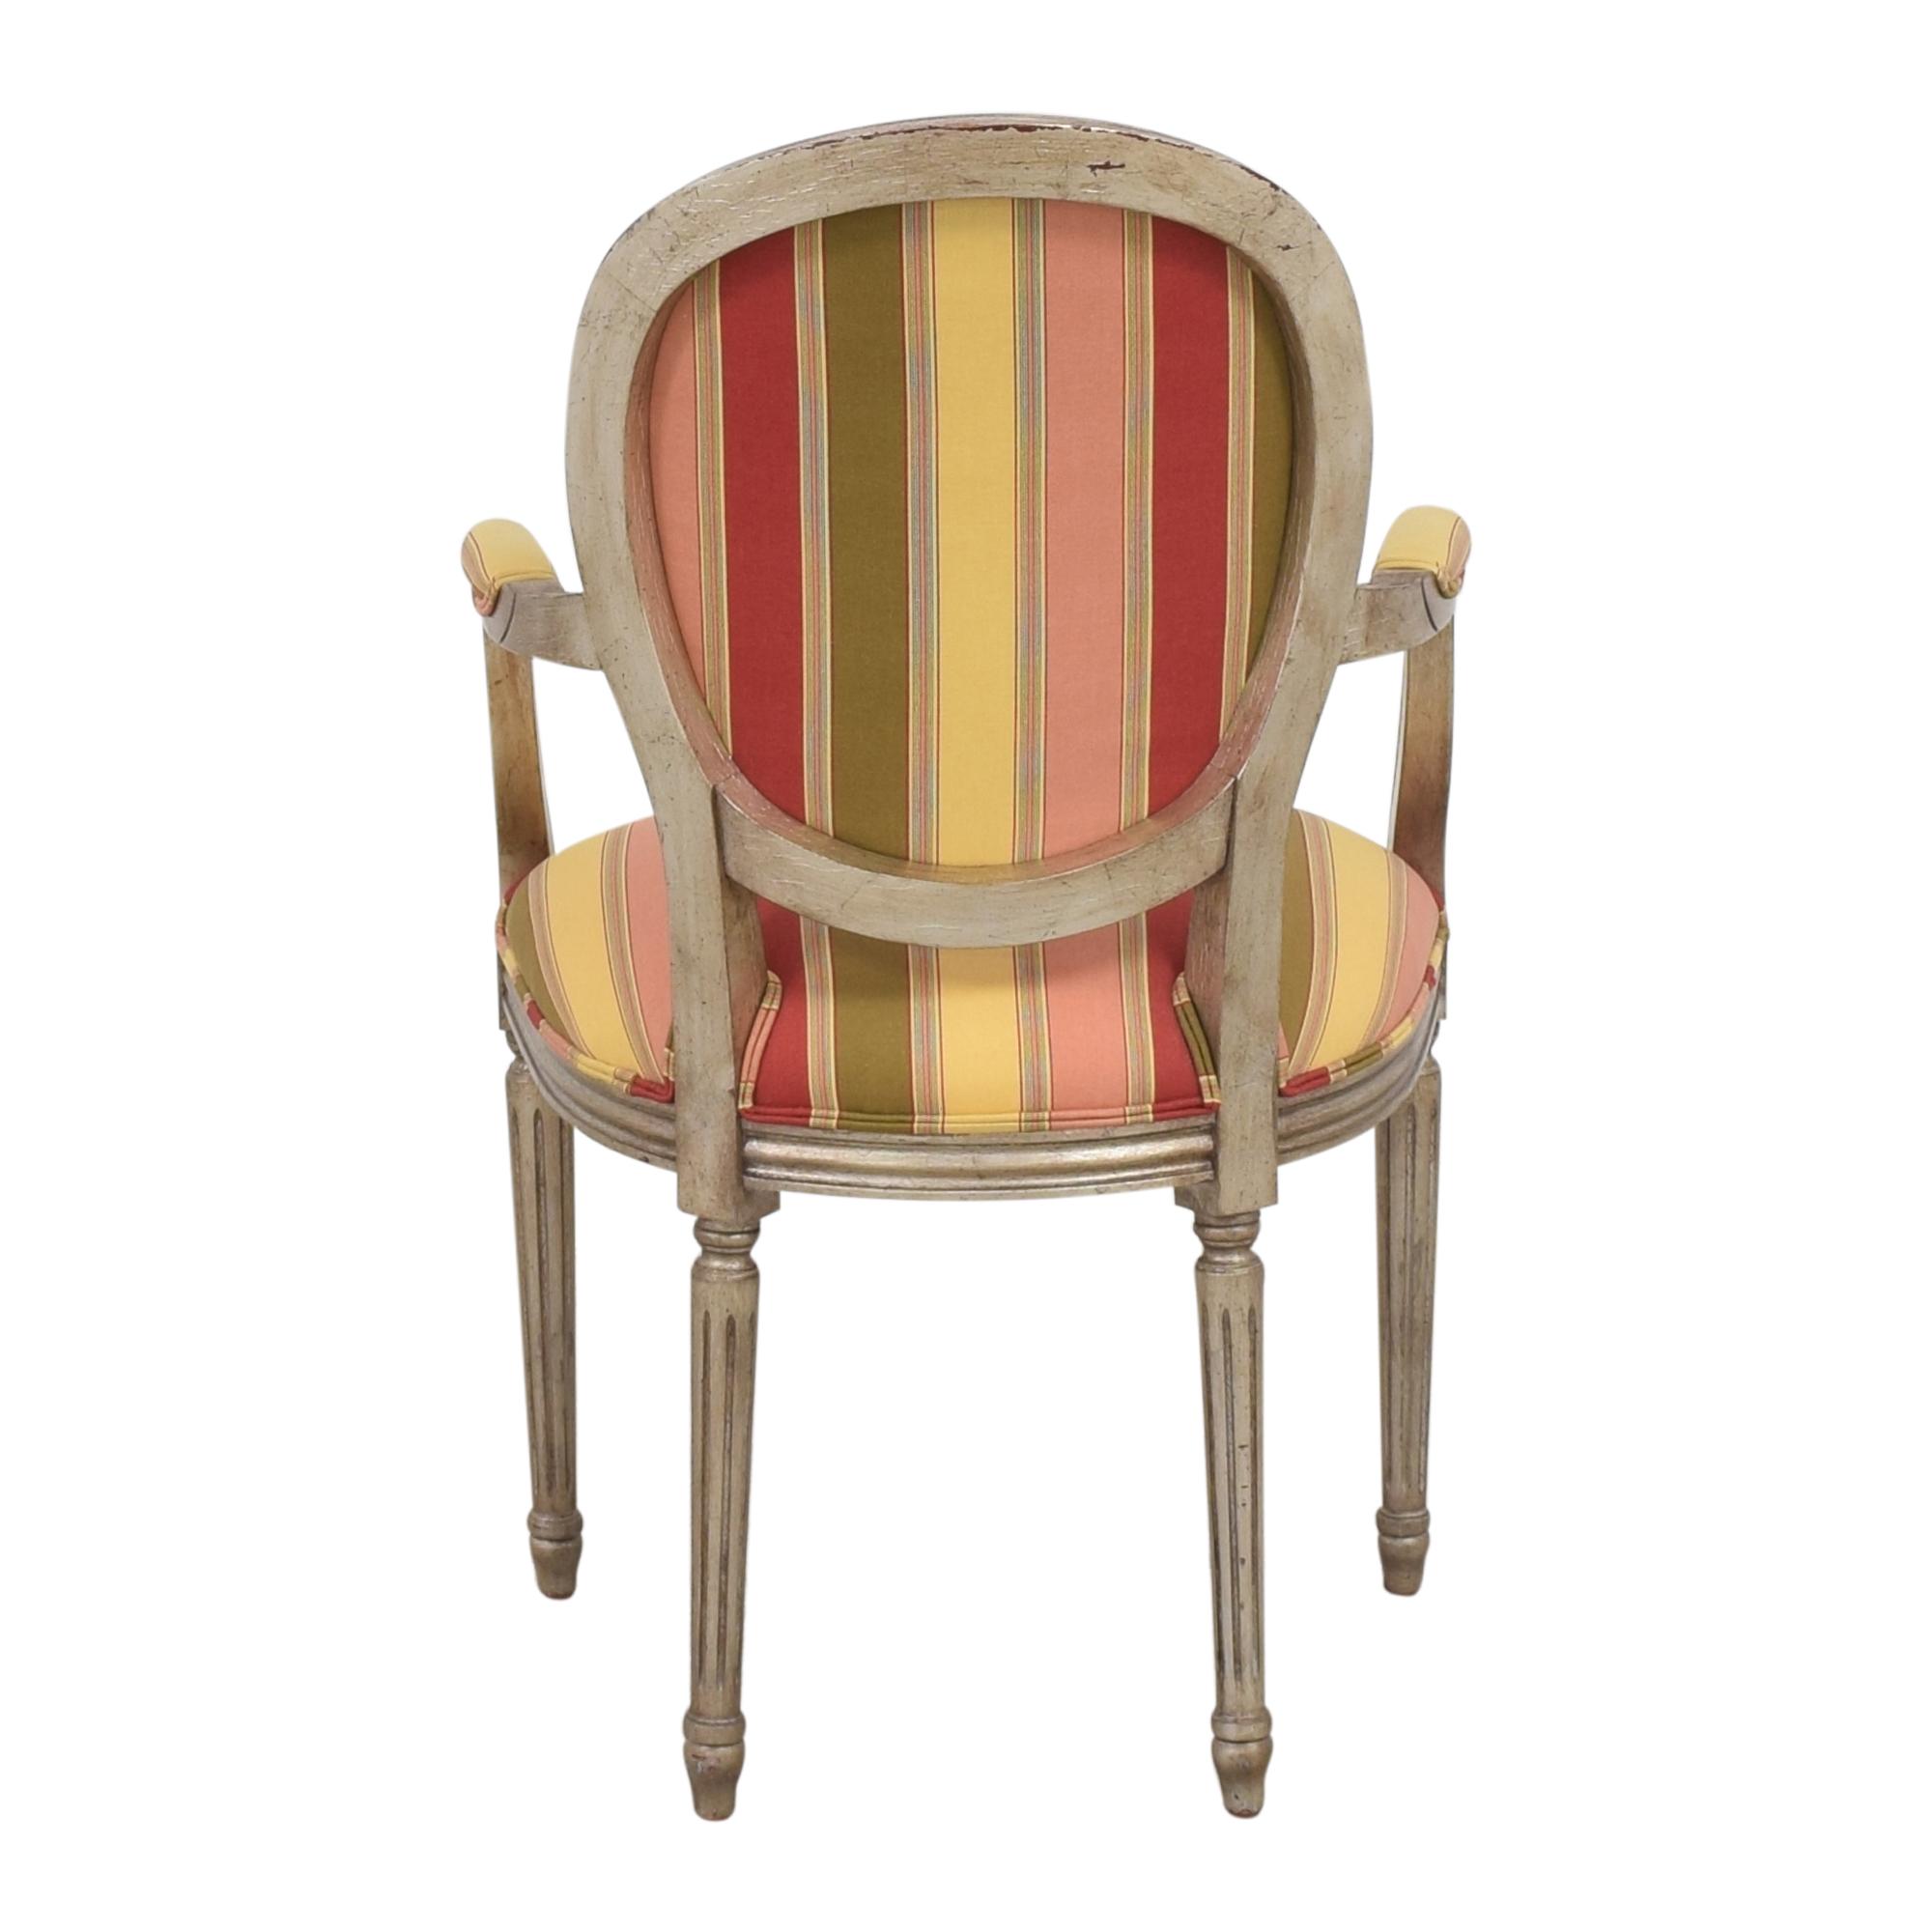 Ethan Allen Ethan Allen Josephine Armchair Chairs